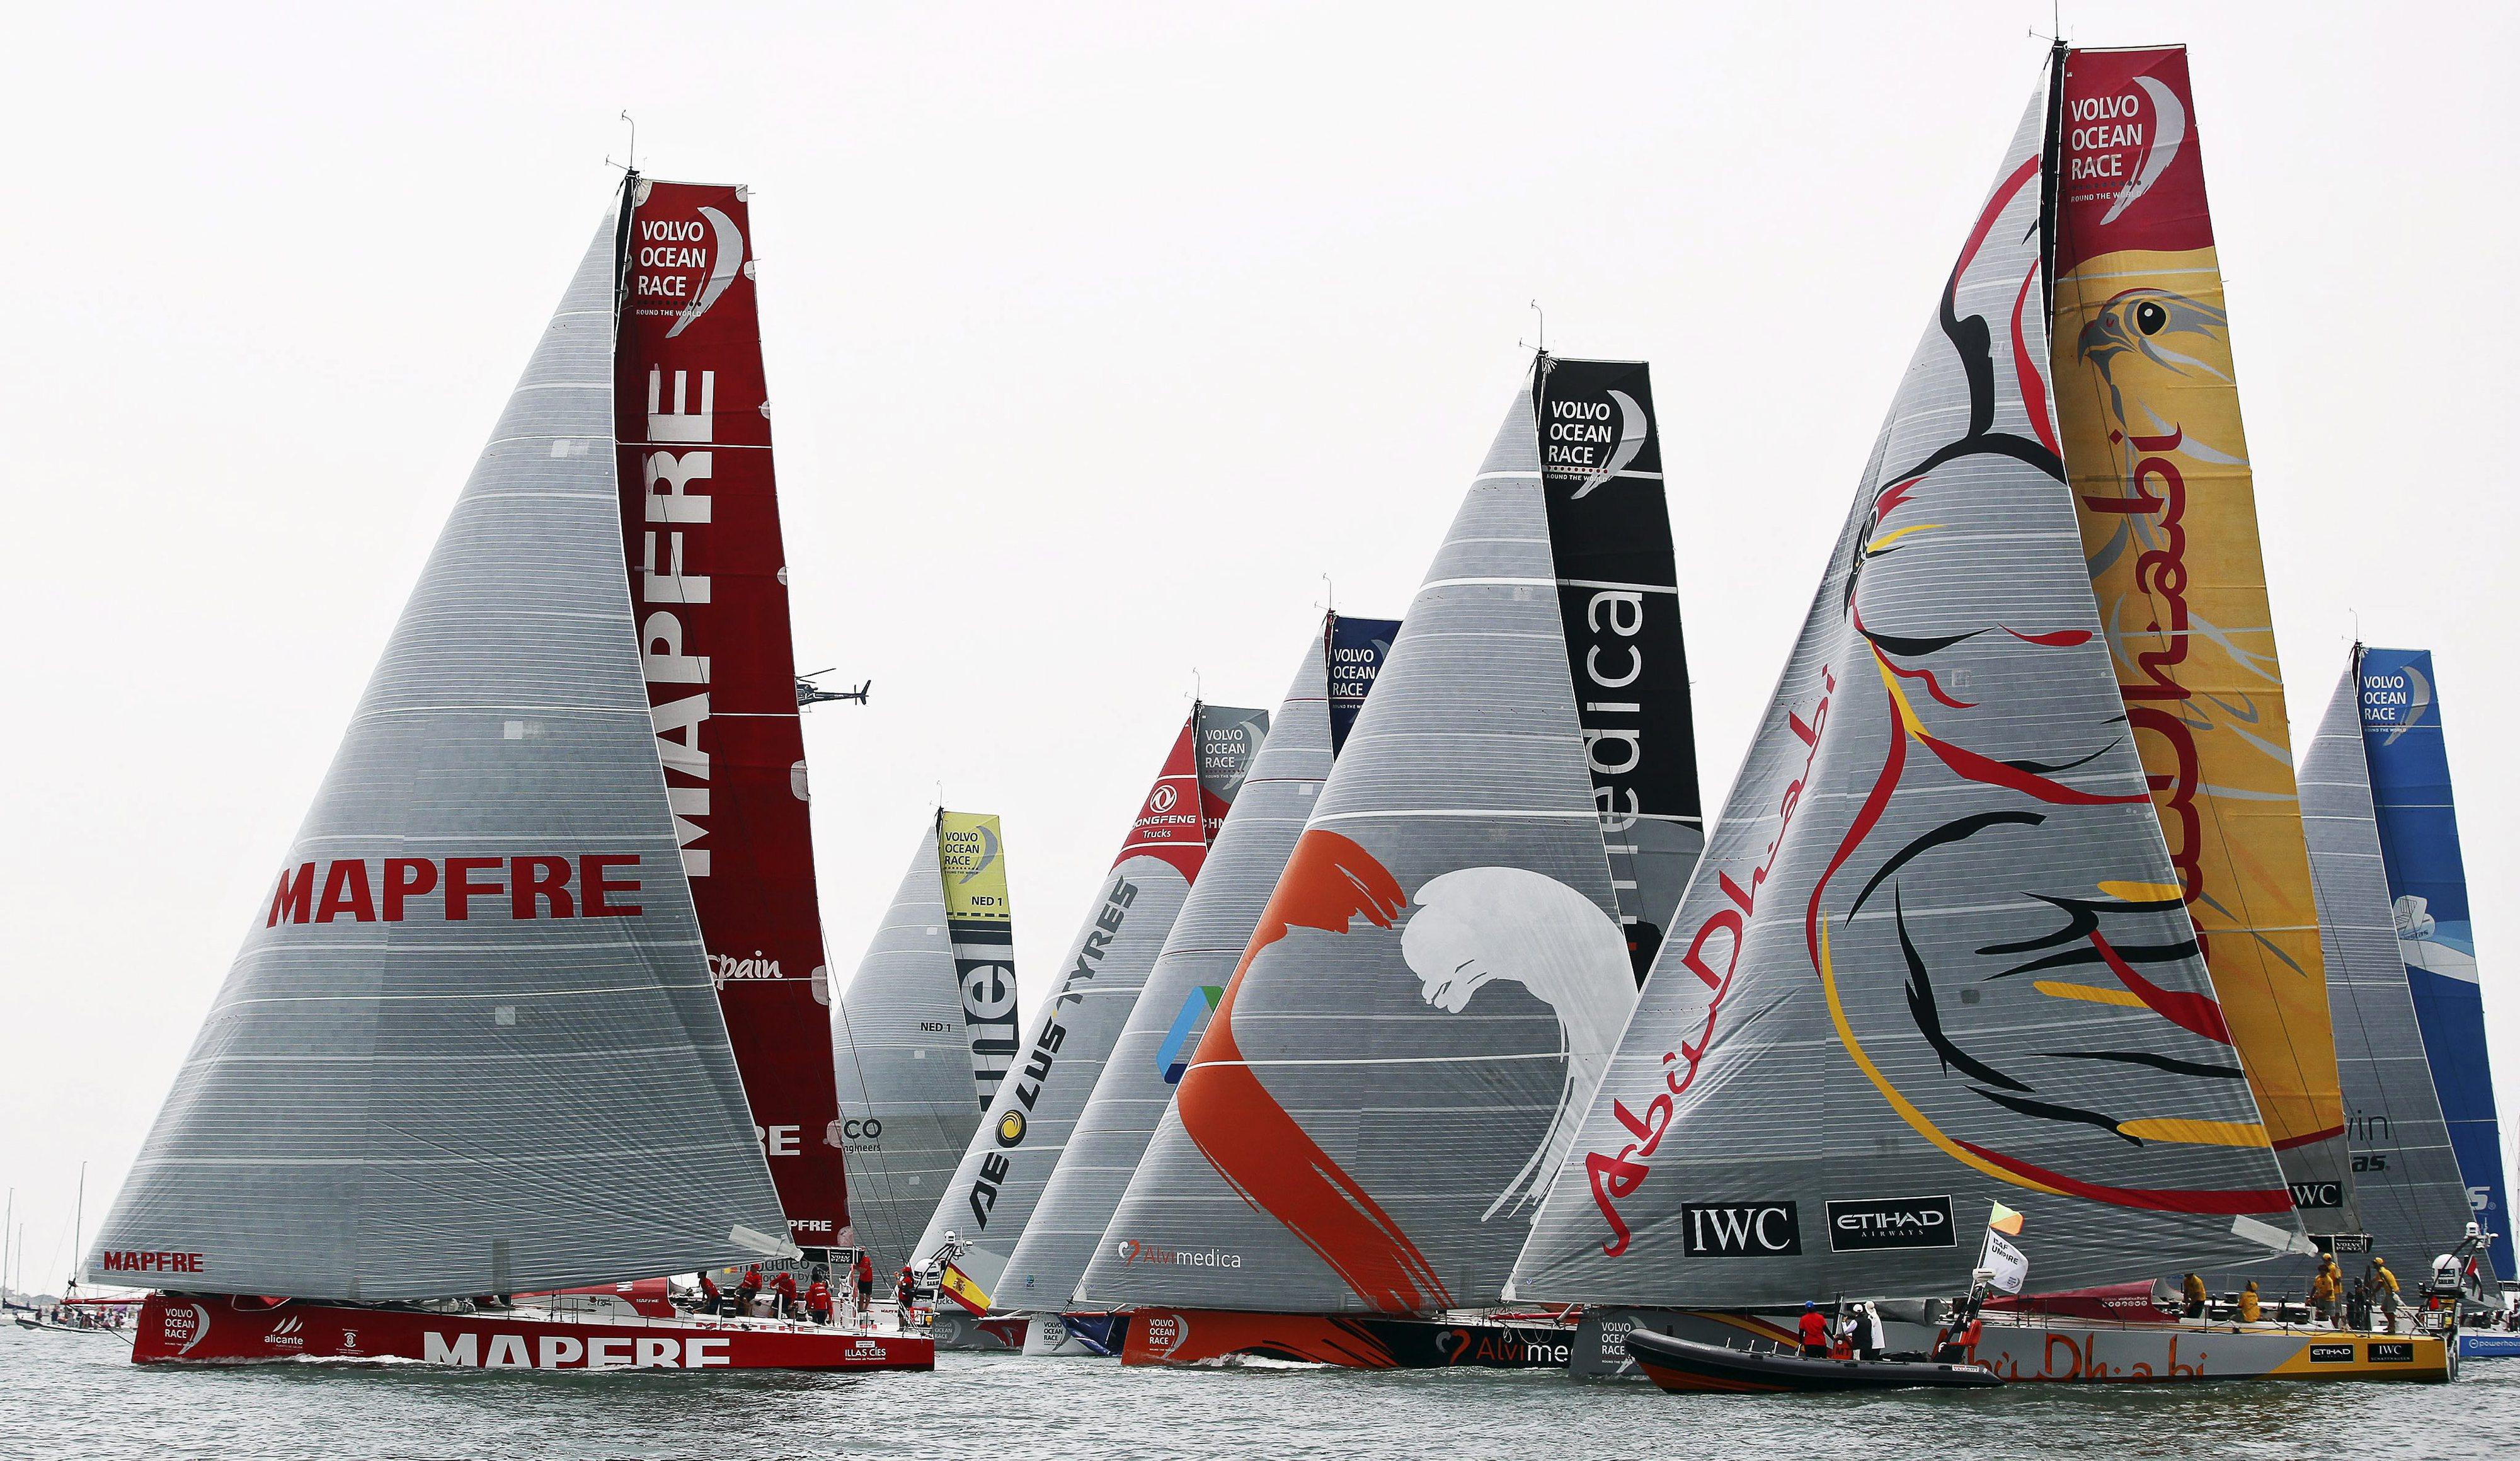 Volvo Ocean Race 'largou' da baía de Alicante diante de milhares de pessoas